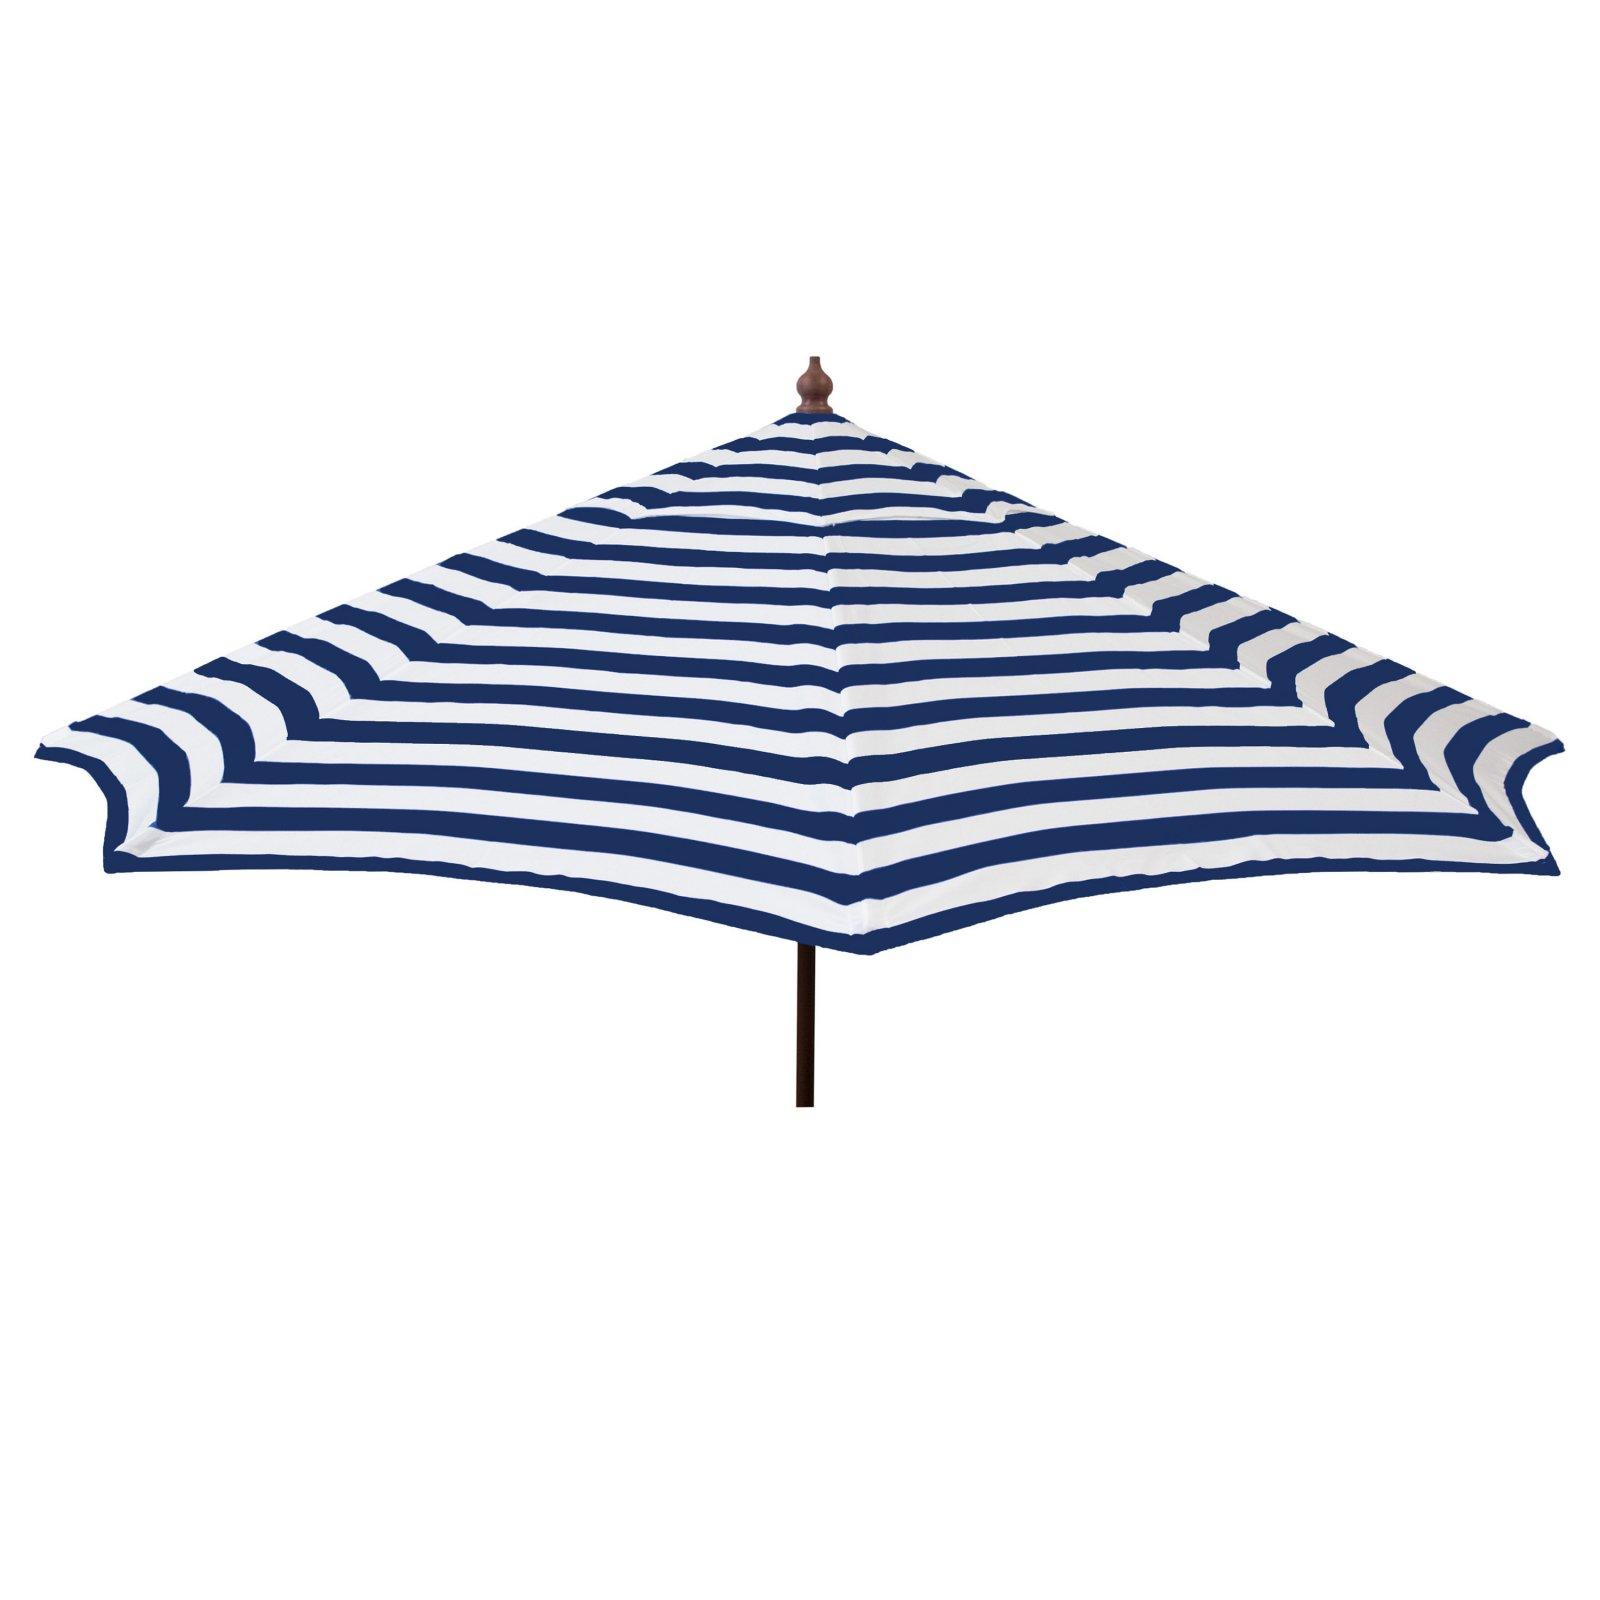 9ft Tilt Italian Market Umbrella Home Patio Canopy Sun Shelter - Blue and White